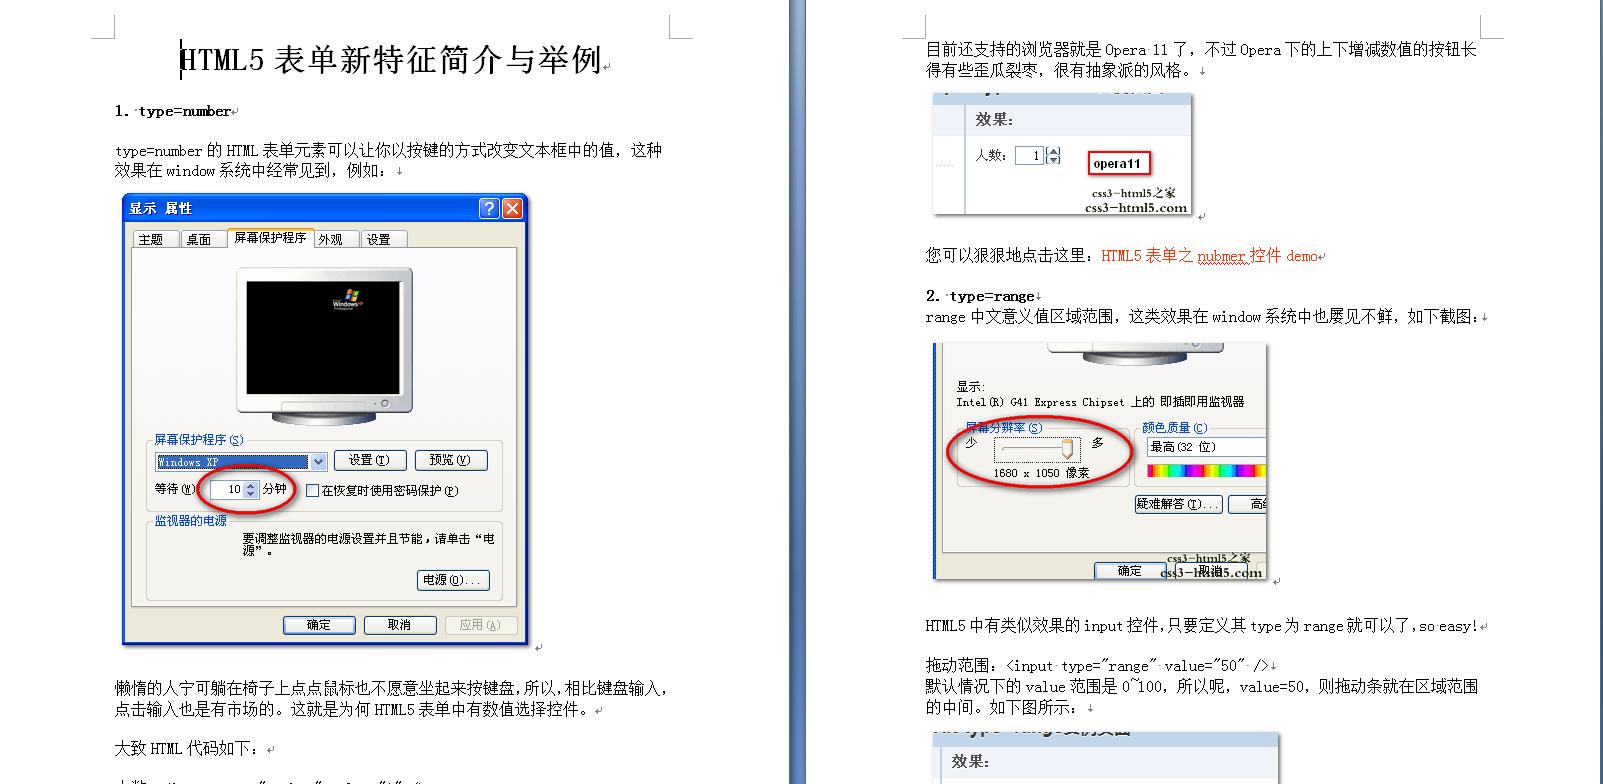 HTML5表单新特征简介与举例